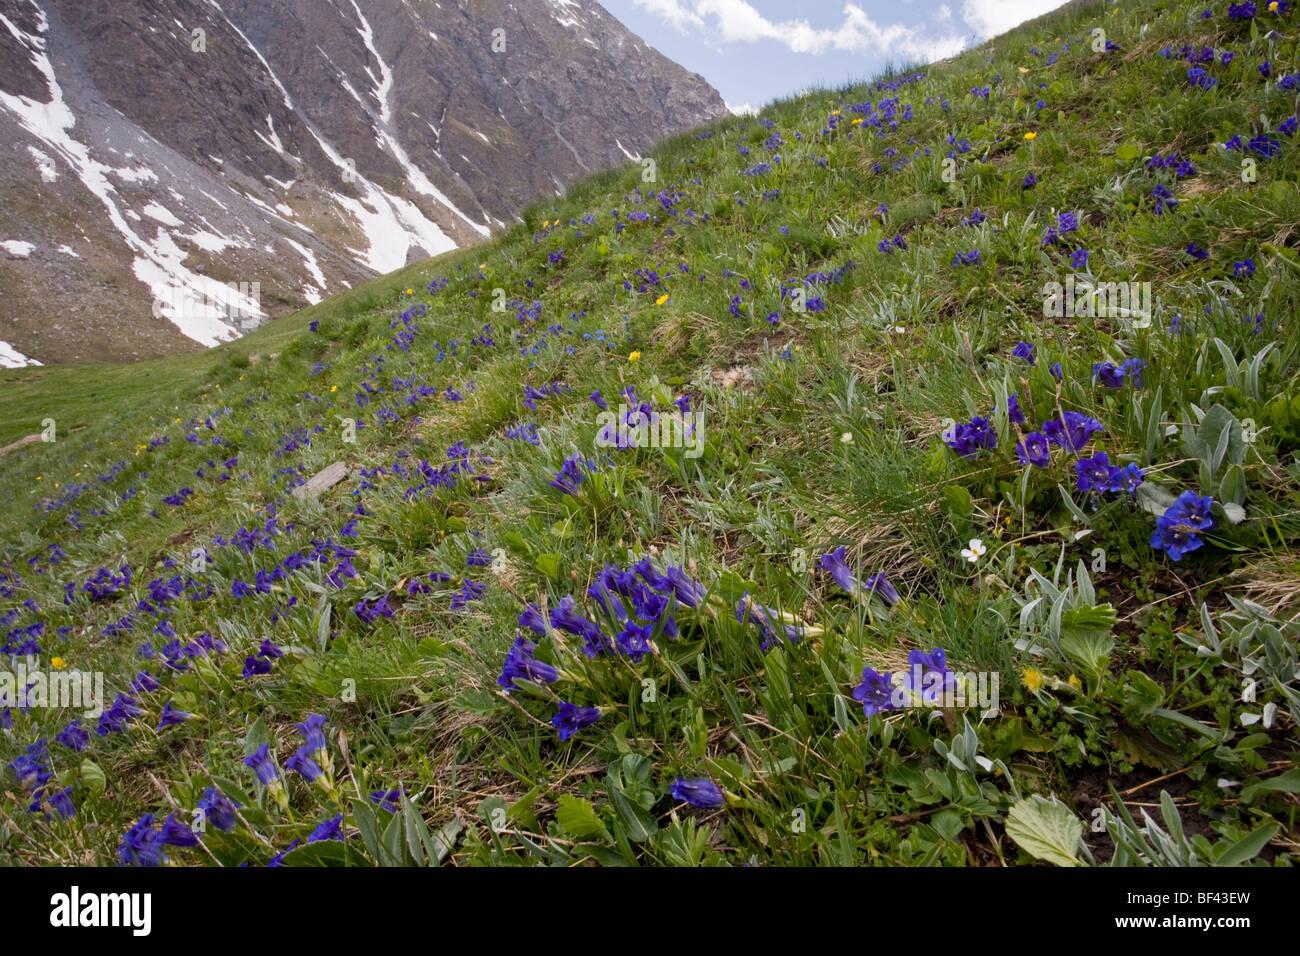 Klettersteig Queyras : Queyras stockfotos bilder alamy